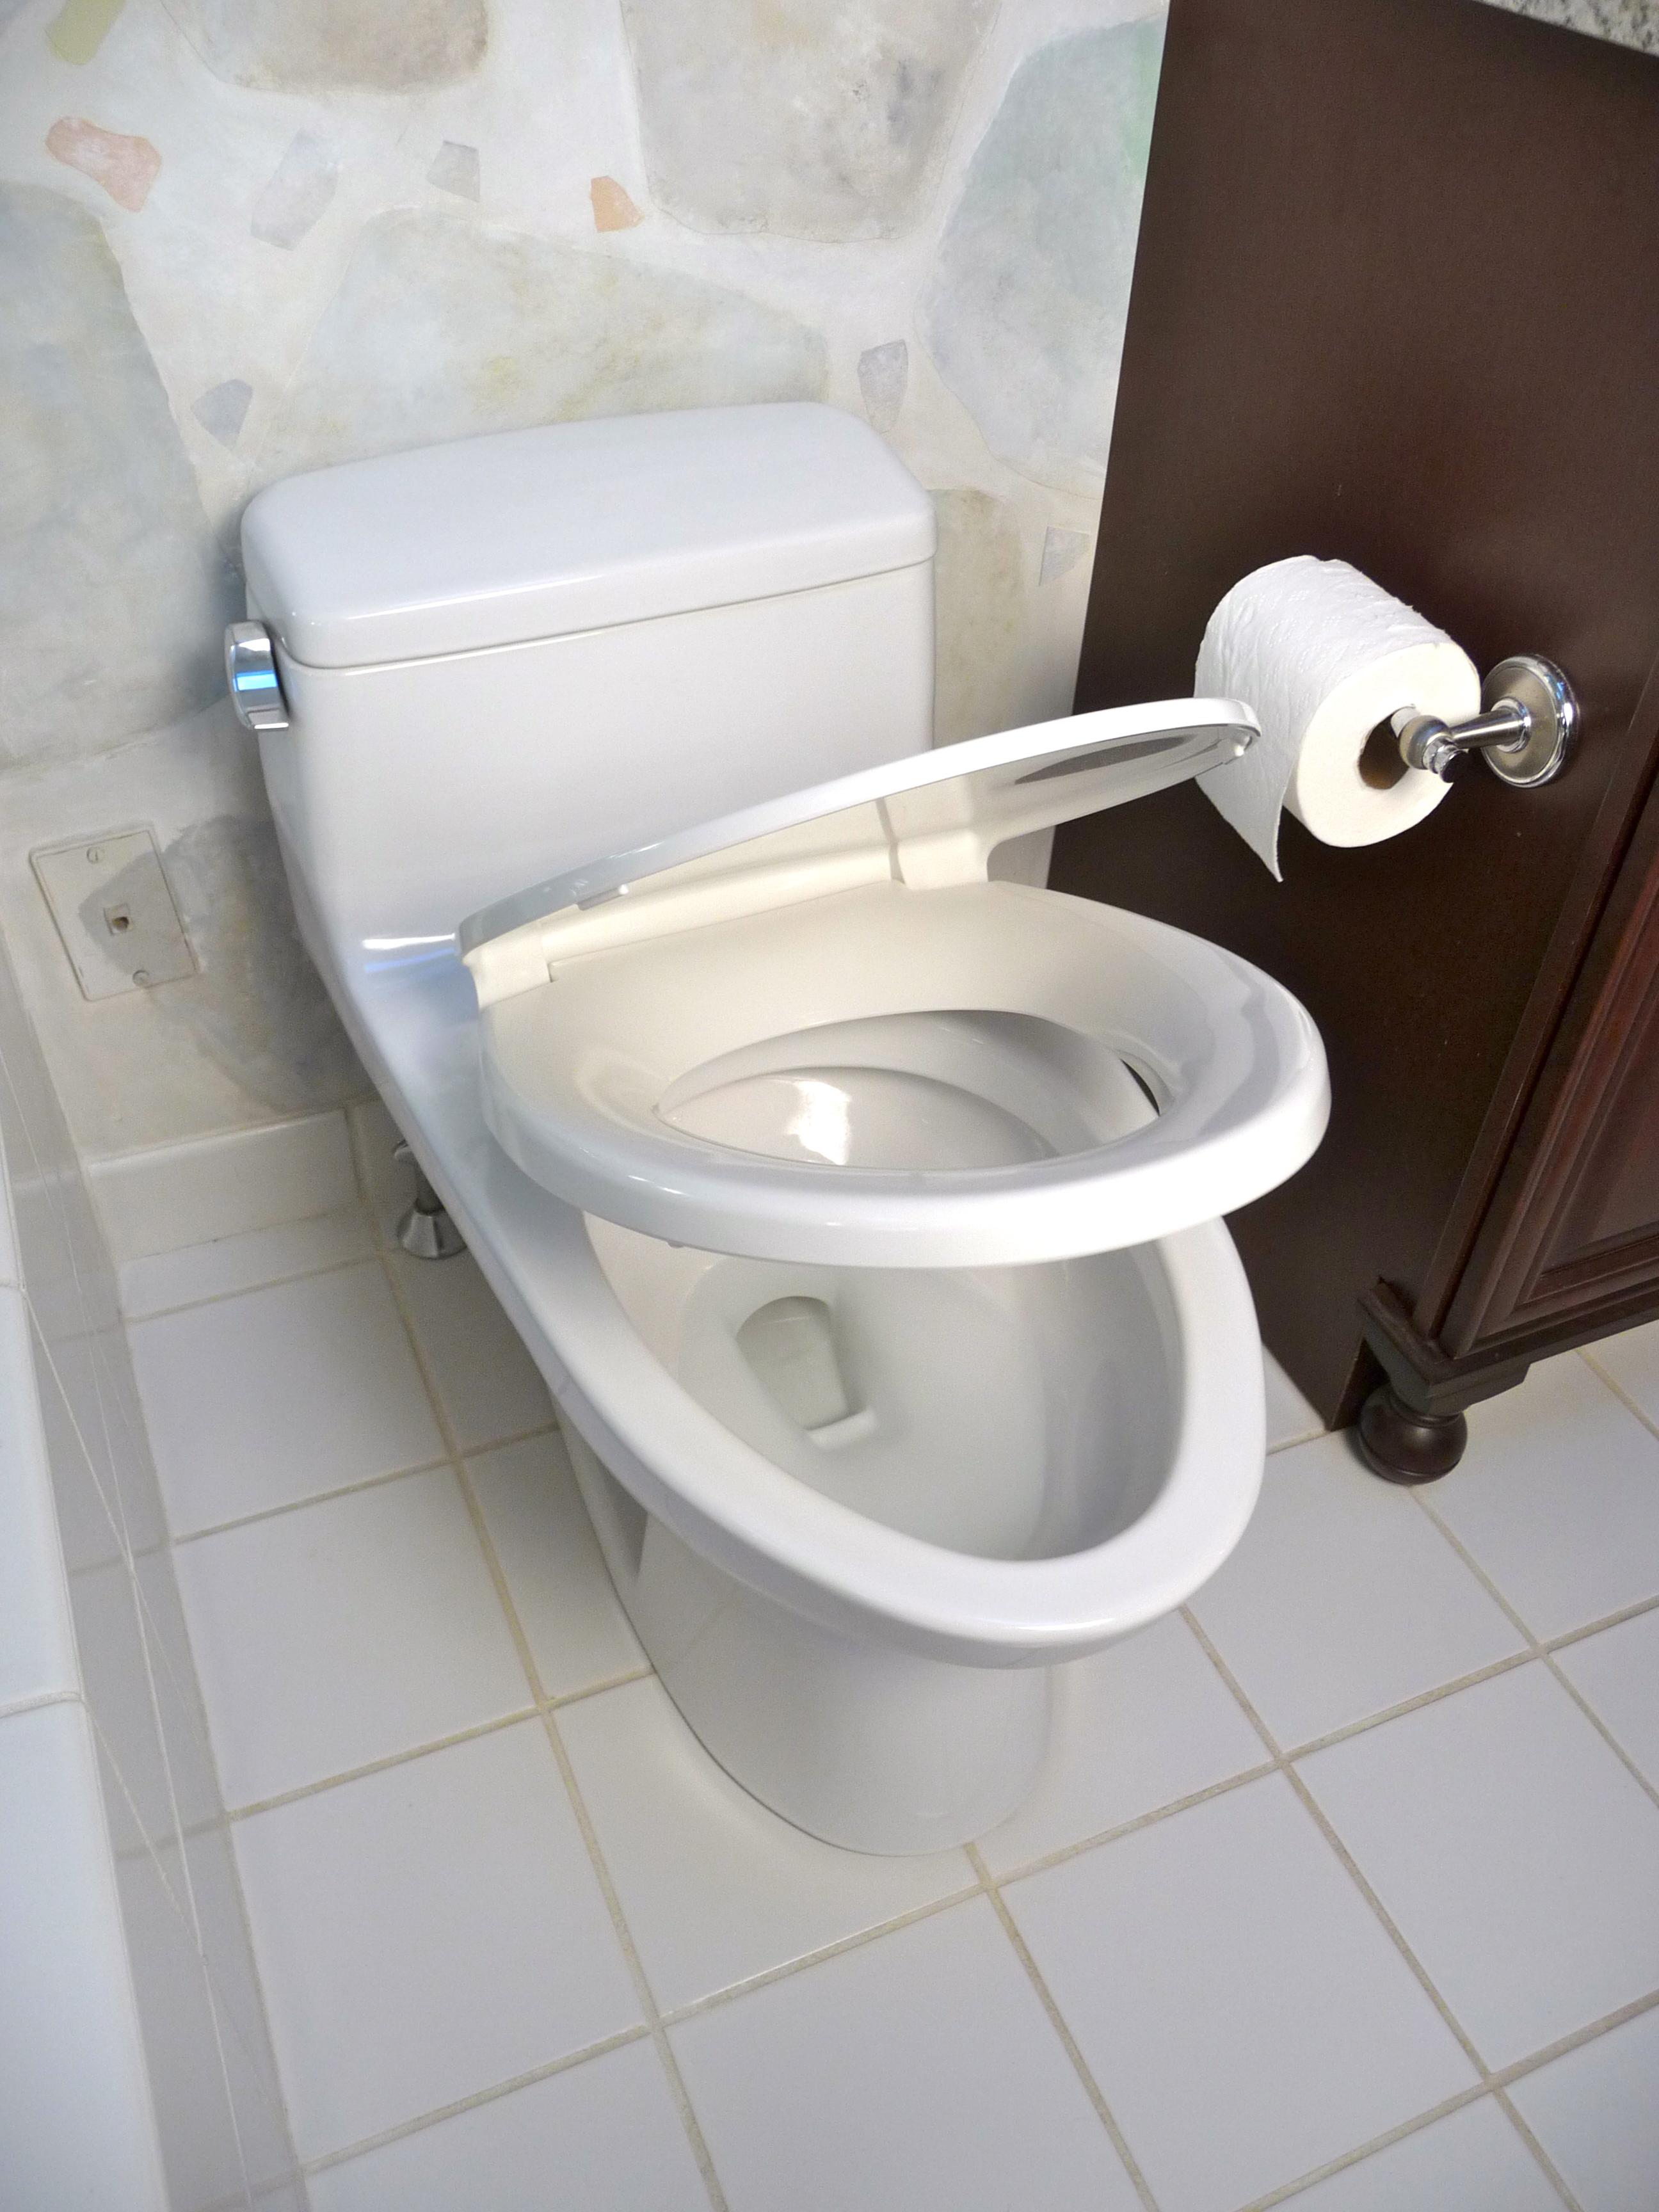 piece aimes toto com toilet gal bowl plumbing totousa scl one elongated